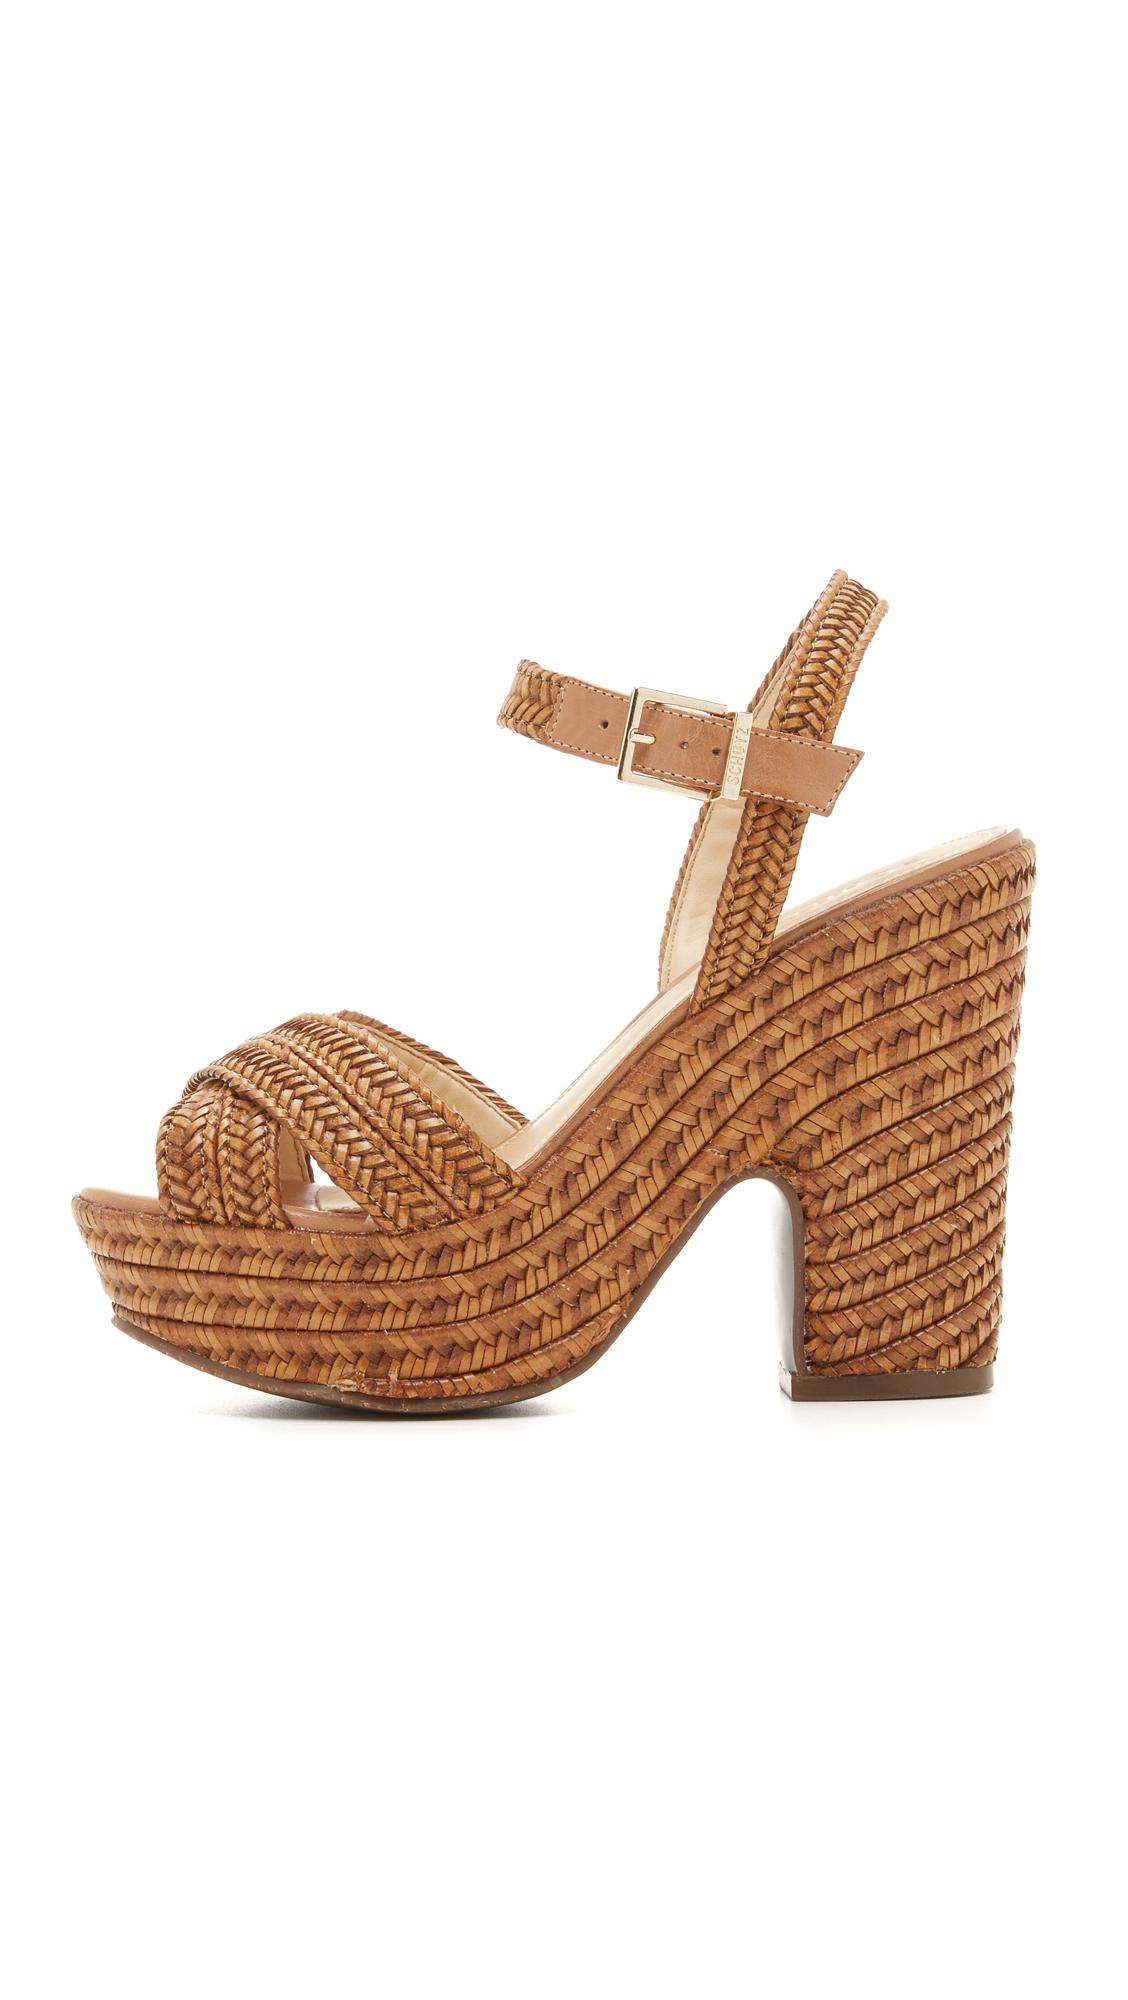 c9d52f56ca5f Schutz Aileen Platform Sandals